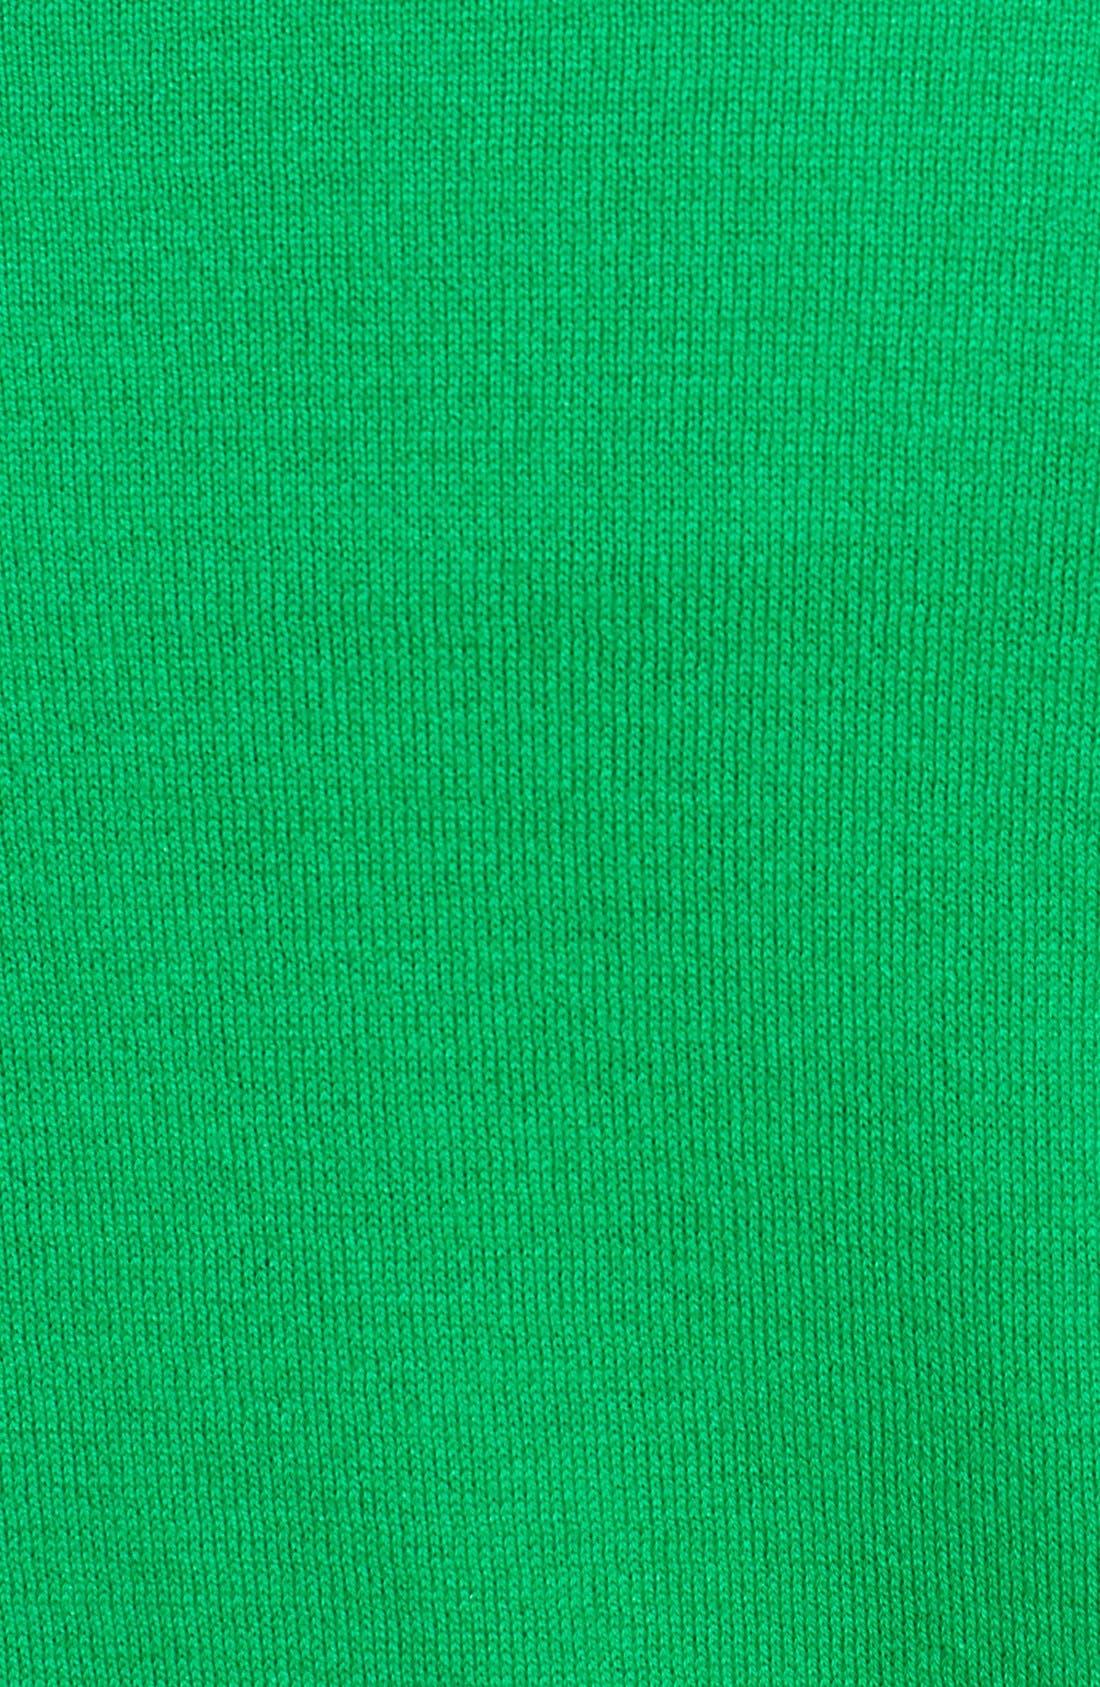 Alternate Image 3  - MICHAEL Michael Kors Colorblock Cotton Blend Crewneck Sweater